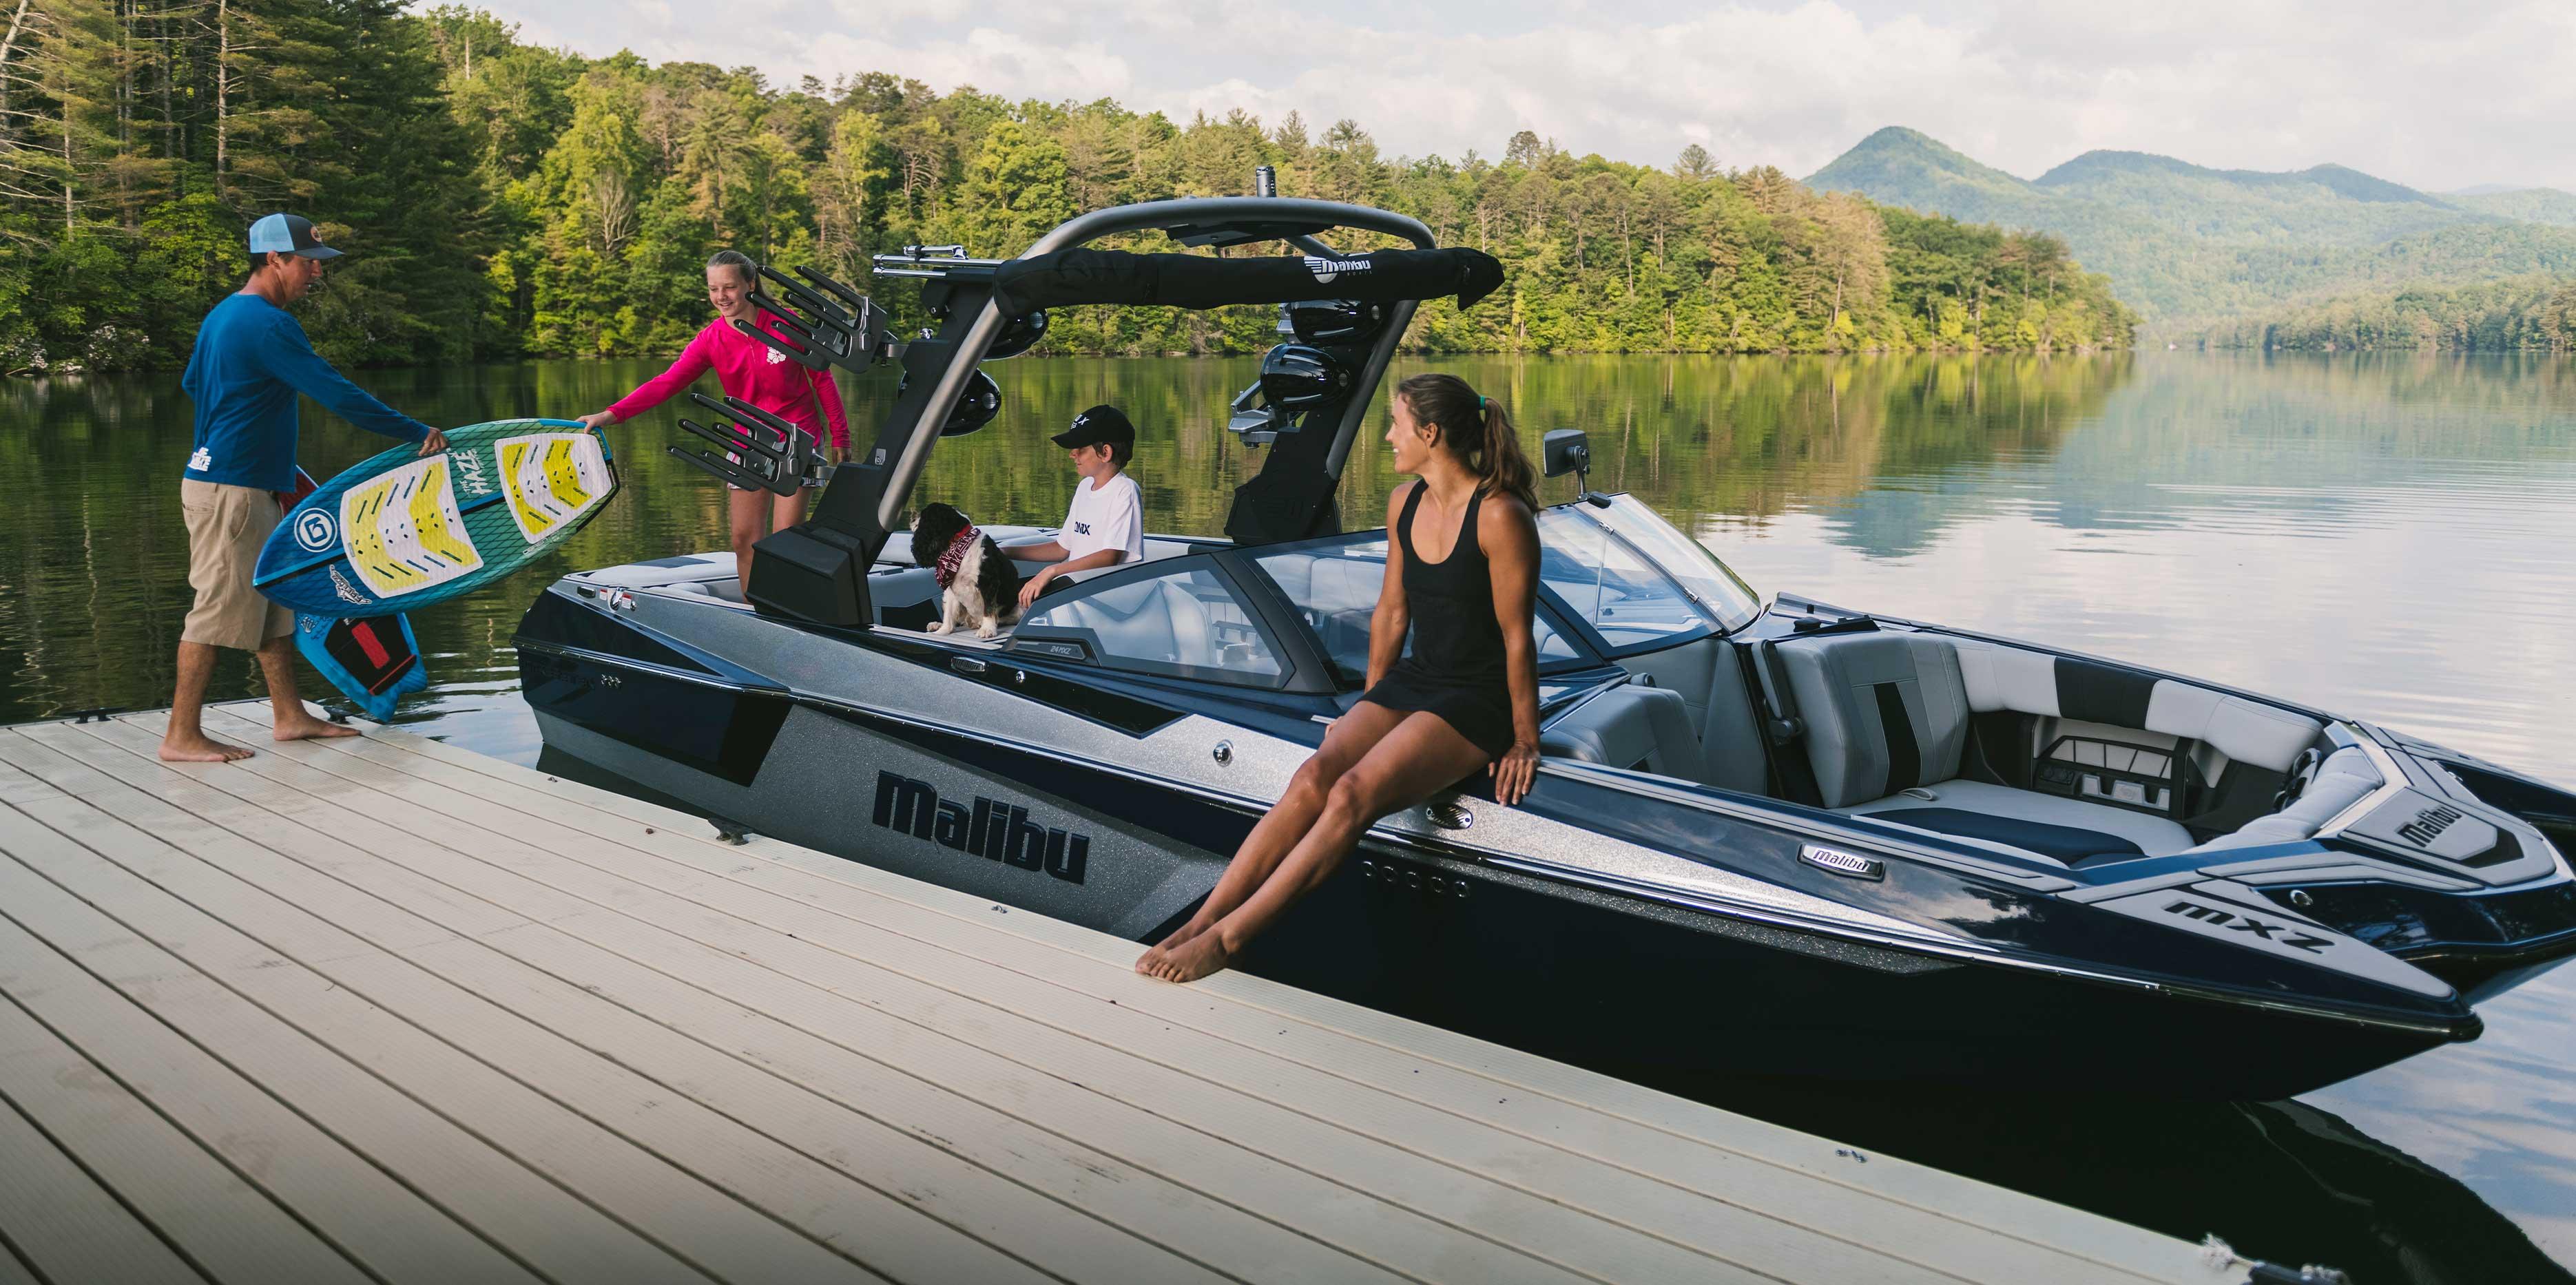 Malibu Boats 24 MXZ docked